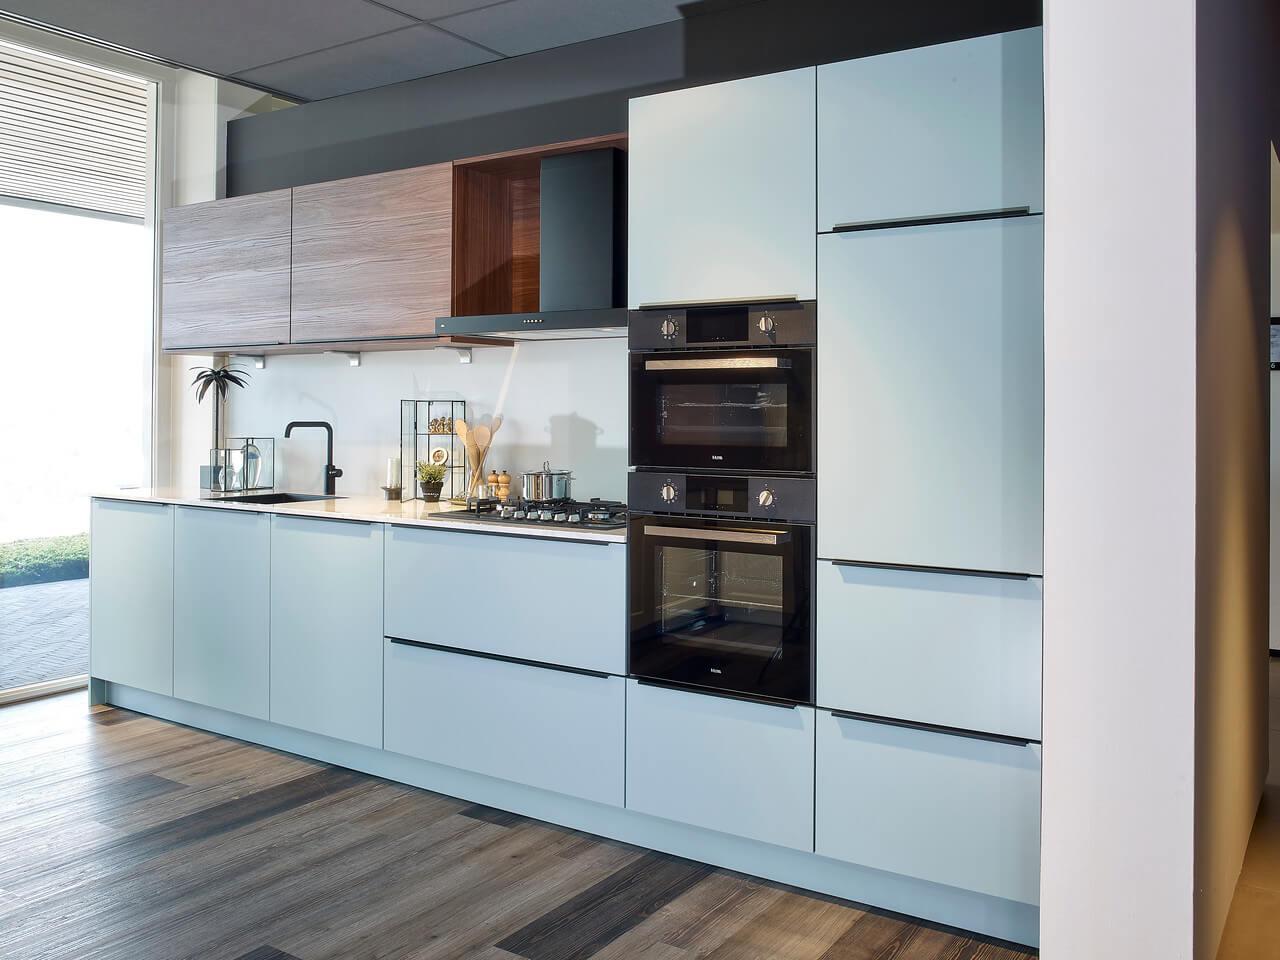 Witte standaard keuken houten bovenkasten